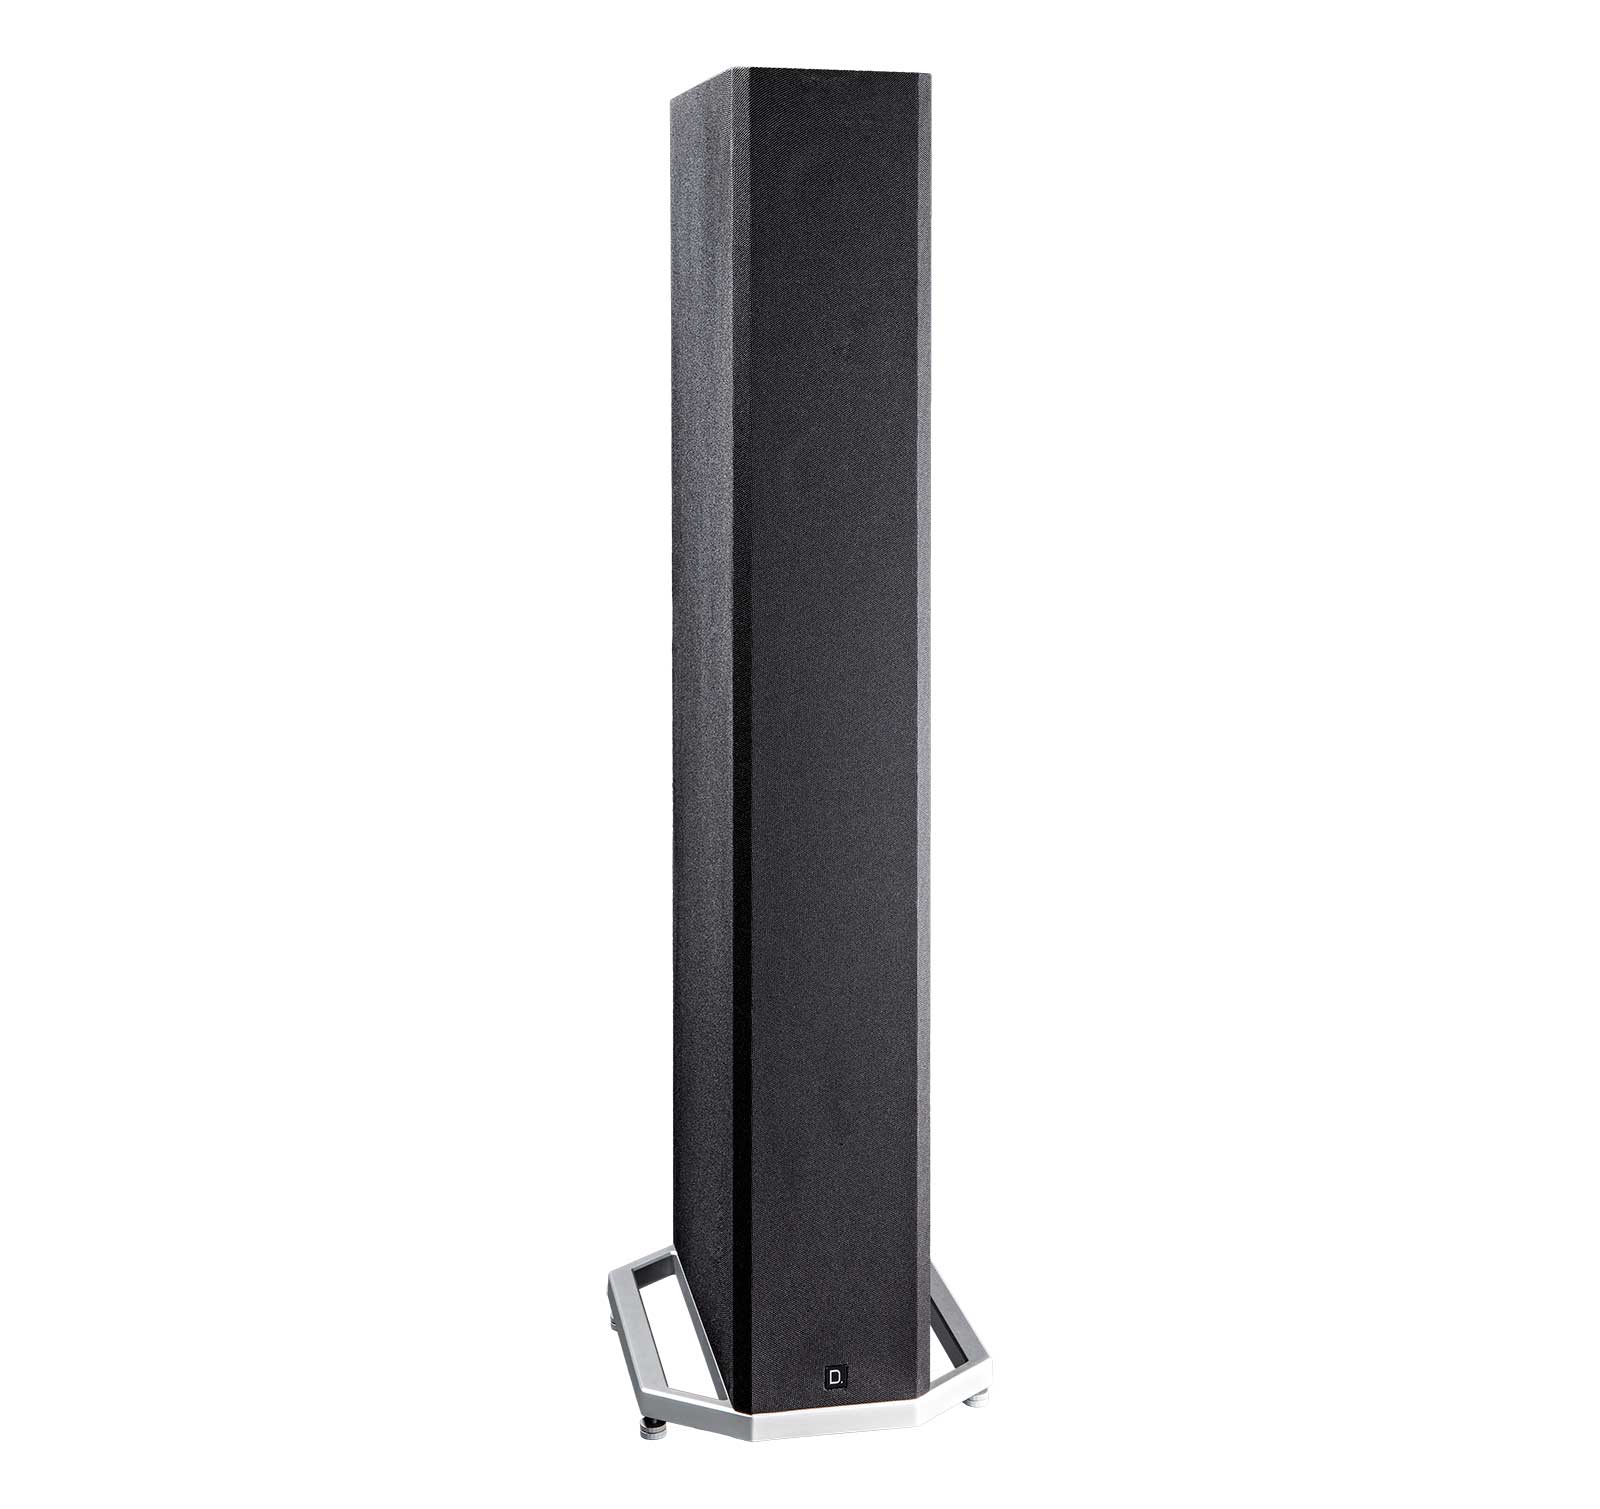 Image of the BP9040 tower speaker